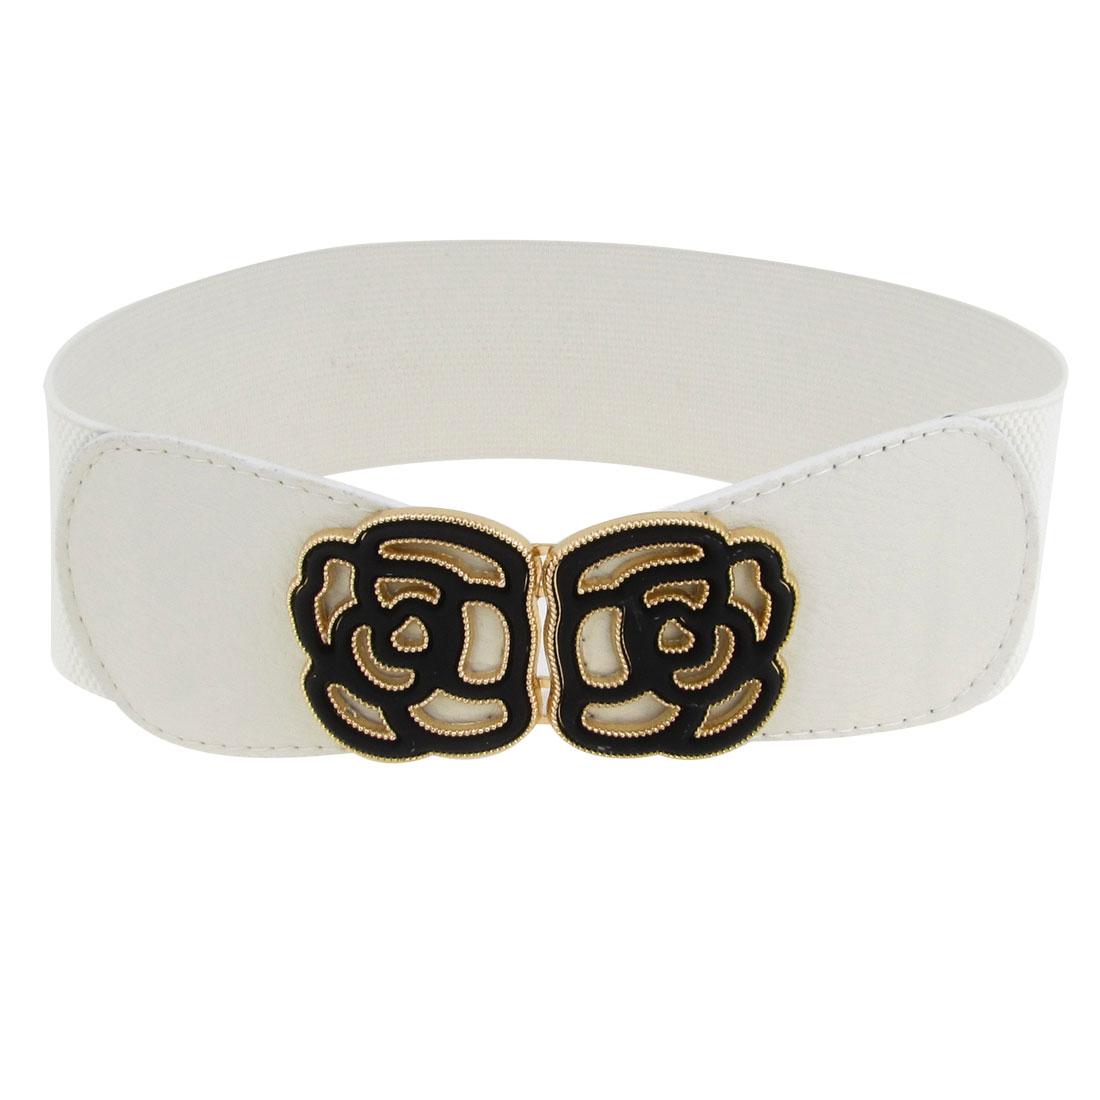 6cm Wide Band Flower Decor Interlock Buckle Stretchy Waistband Waist Belt White